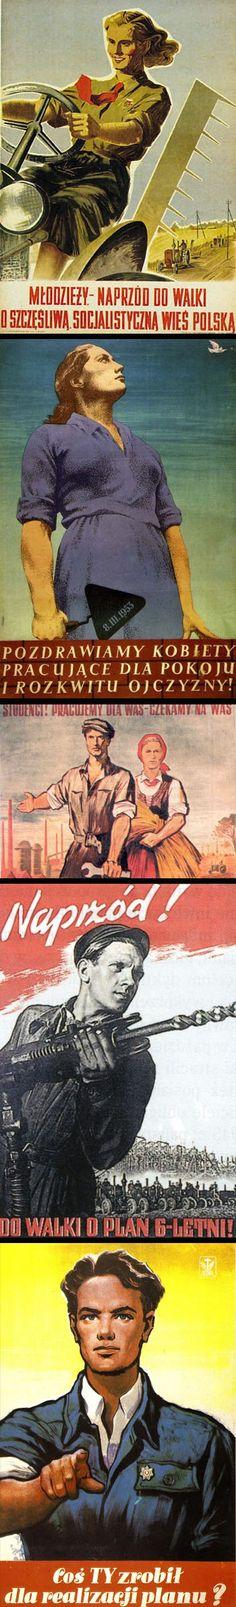 plakat_propagandowy_prl_3_design_po_polsku_zsah Retro, Movies, Movie Posters, Design, Art, Historia, Art Background, Films, Film Poster